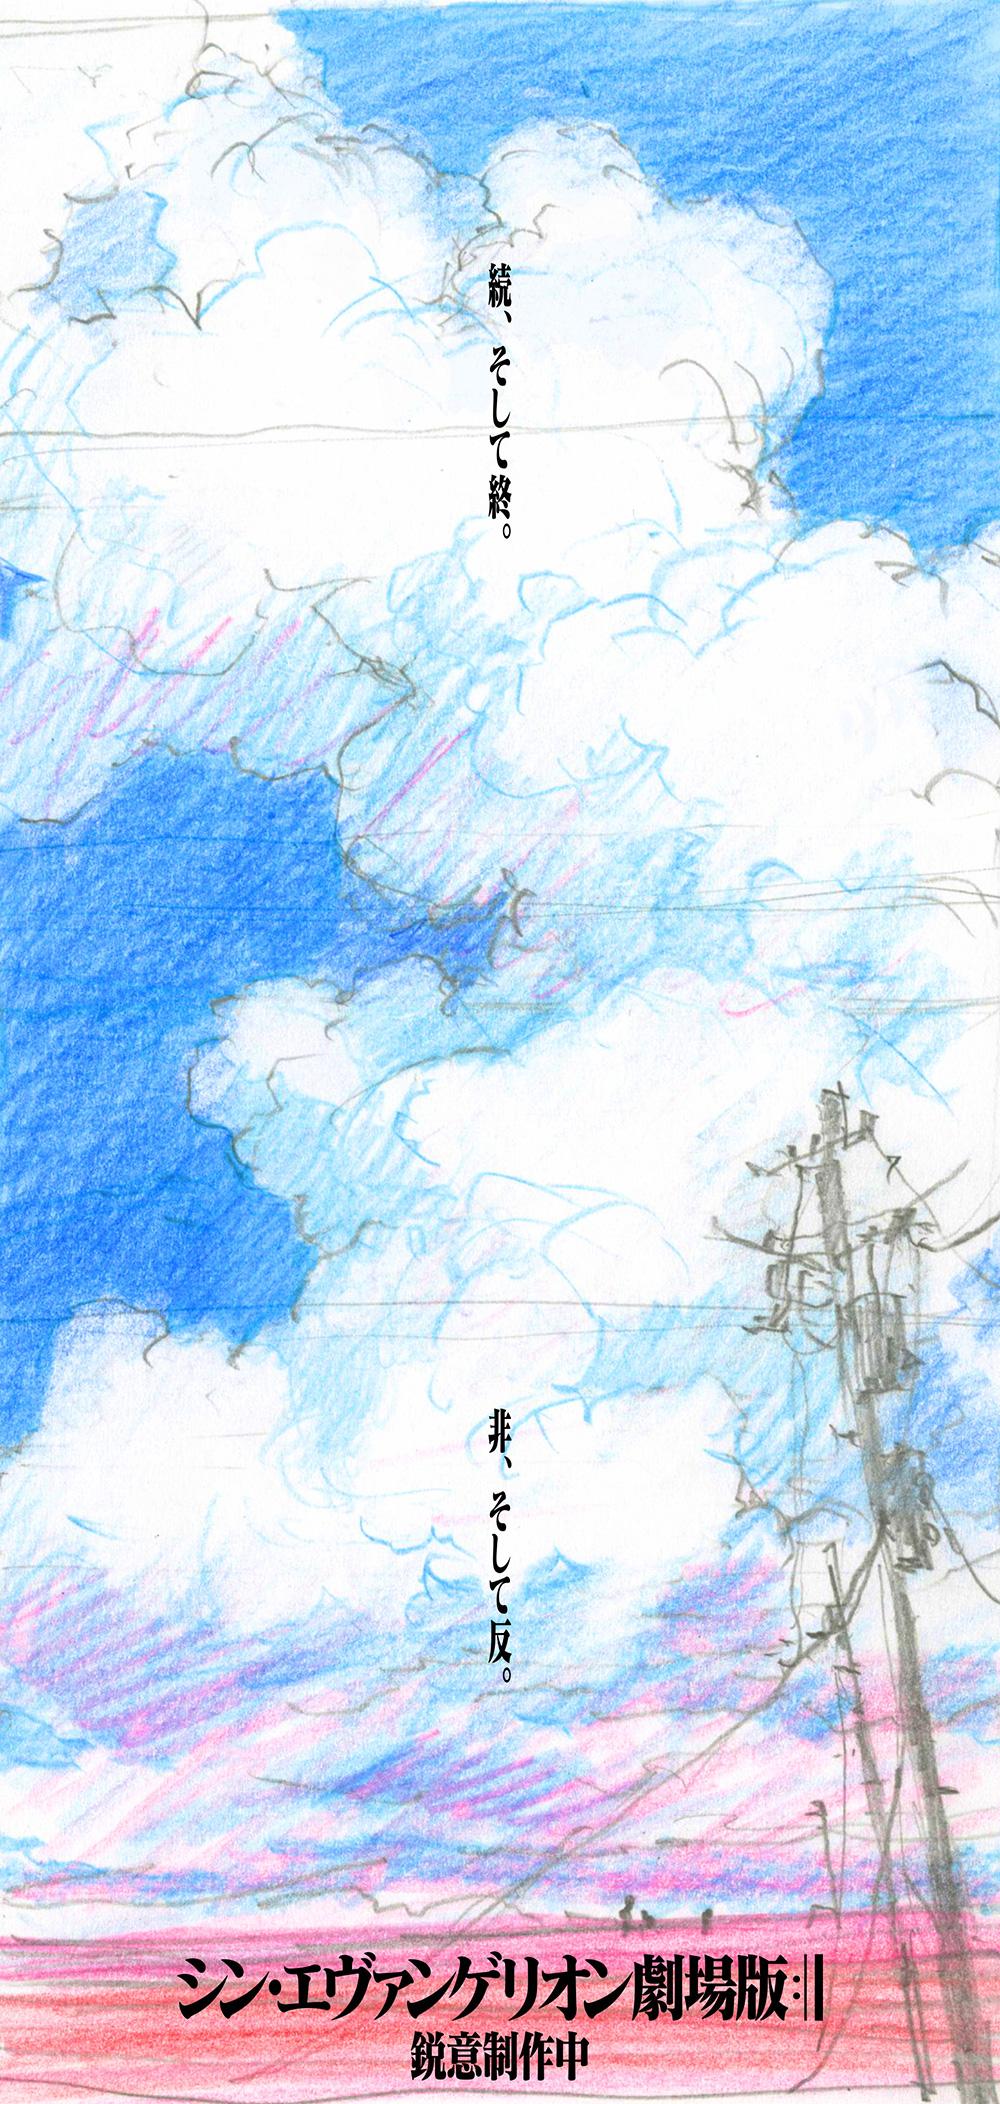 Evangelion-3.0-+-1.0-Visual